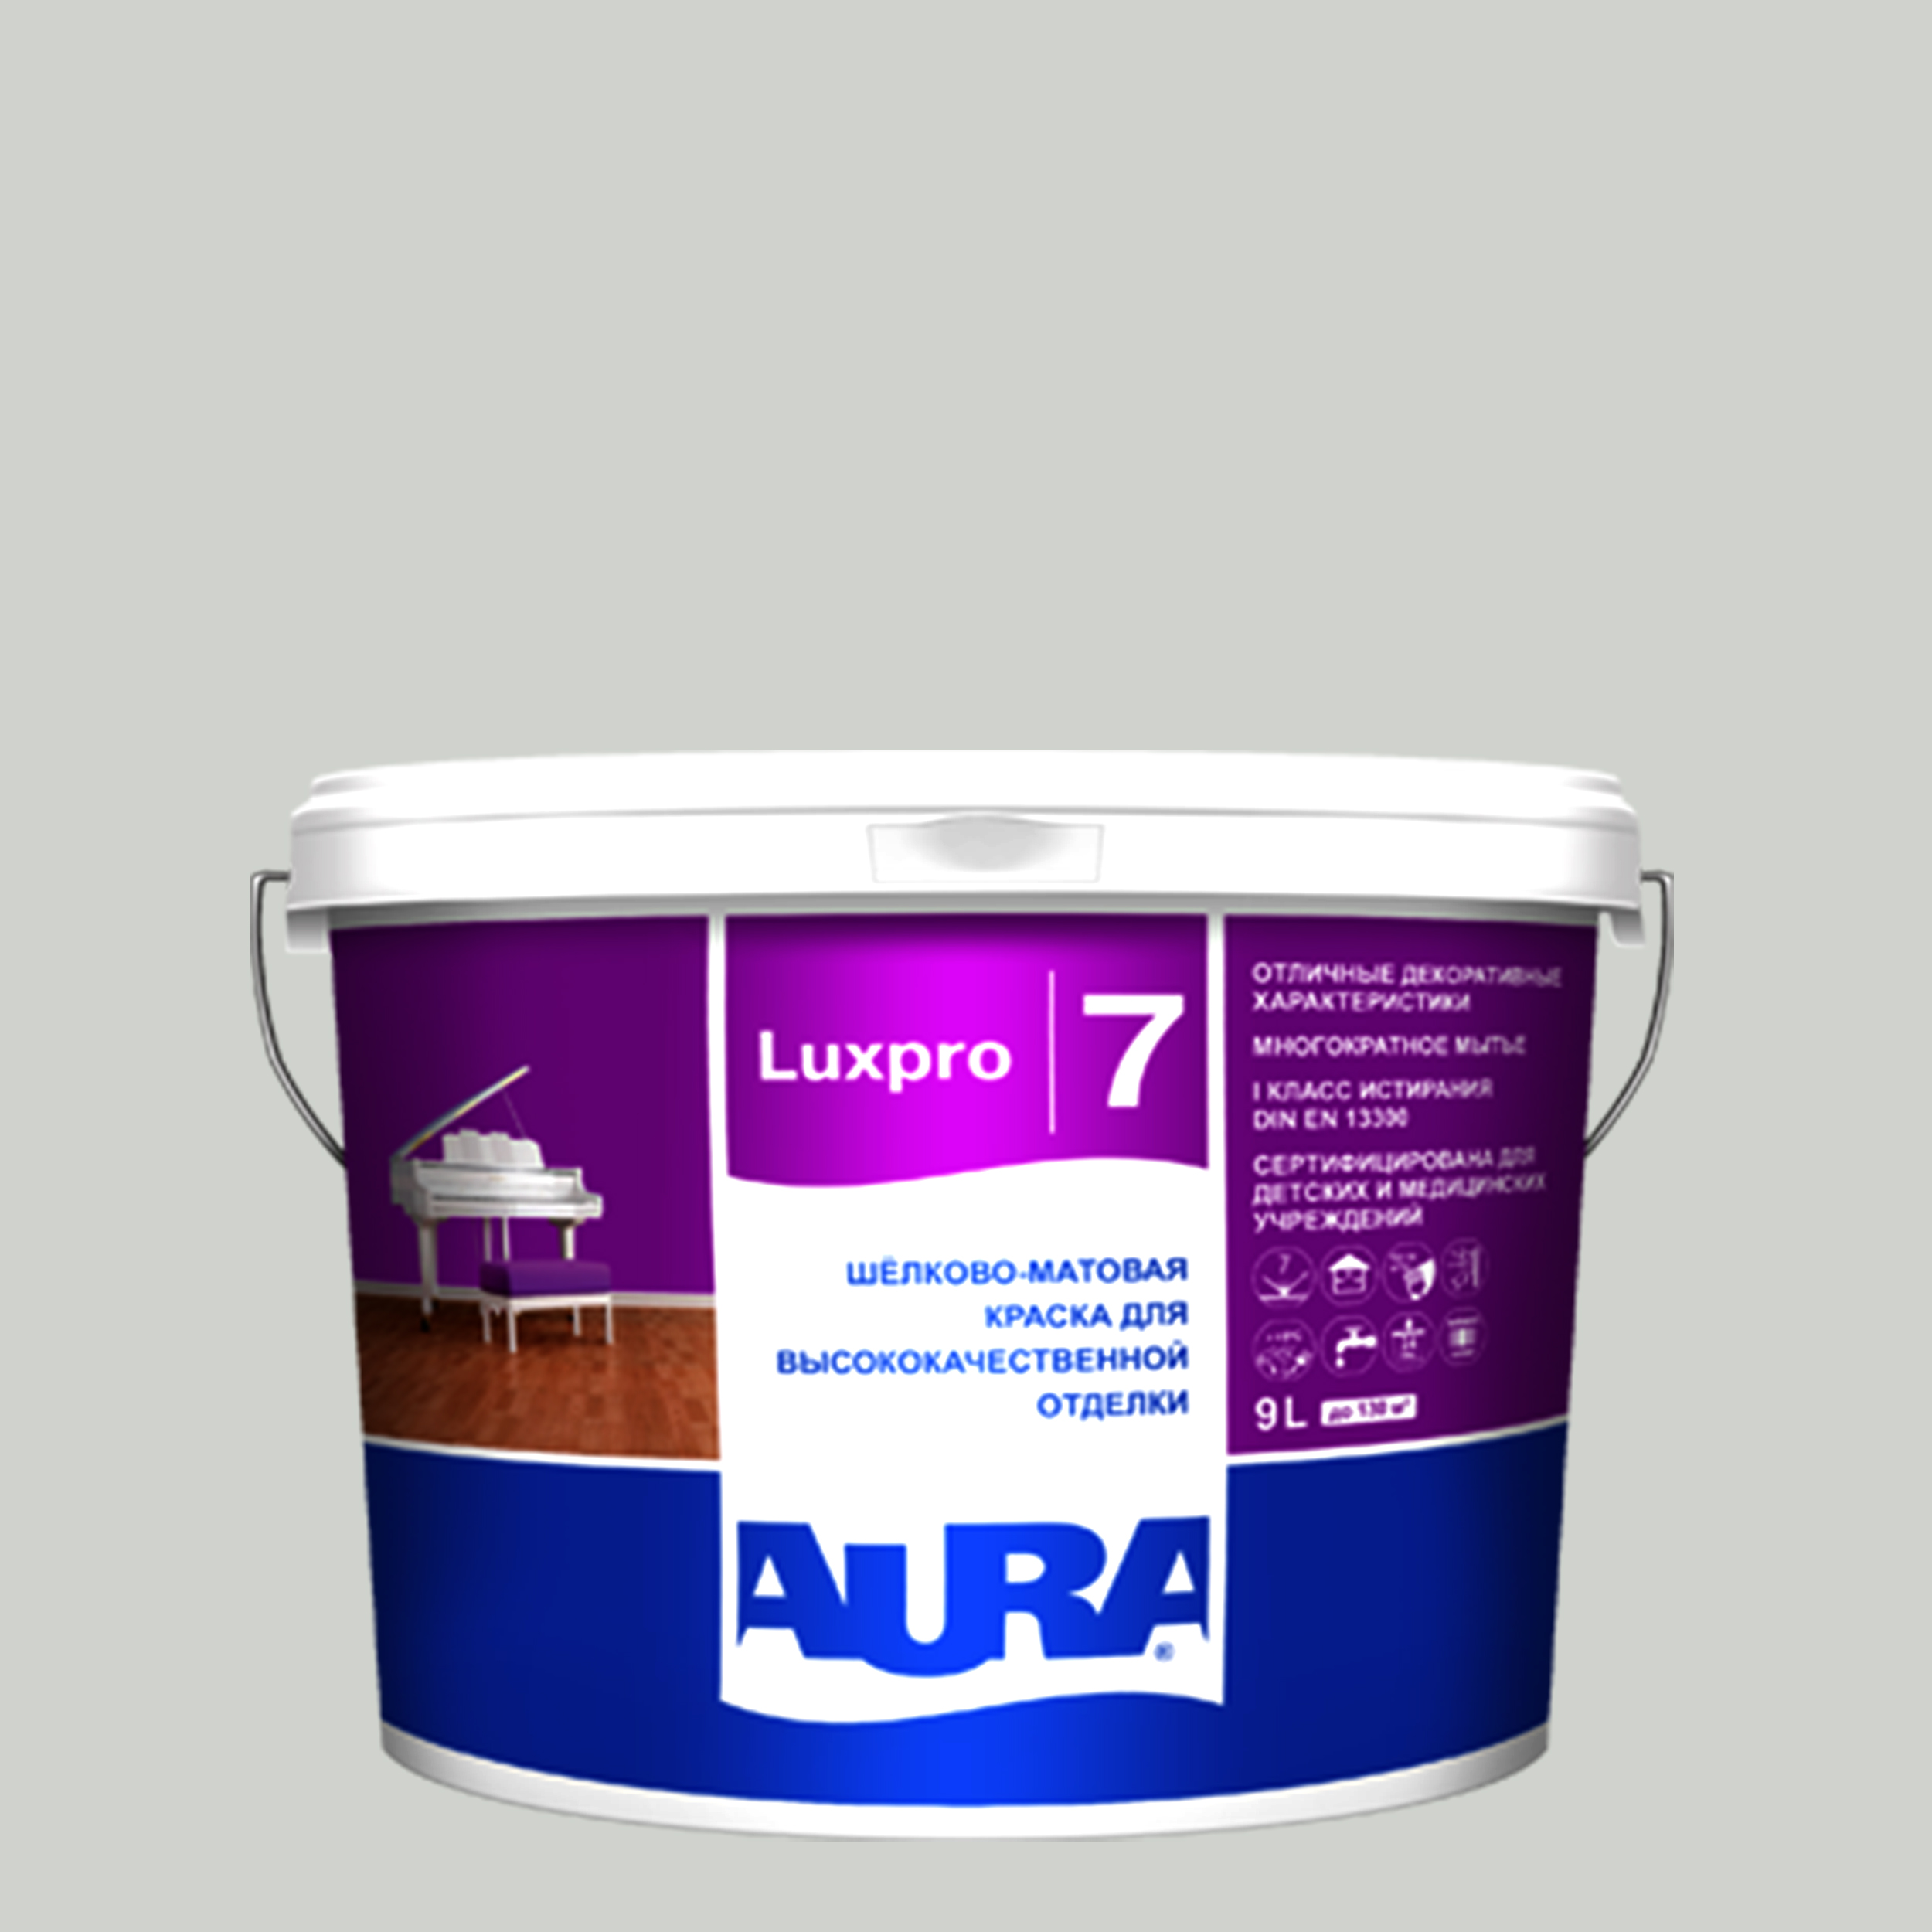 Фото 4 - Краска интерьерная, Aura LuxPRO 7, RAL 6025, 11 кг.